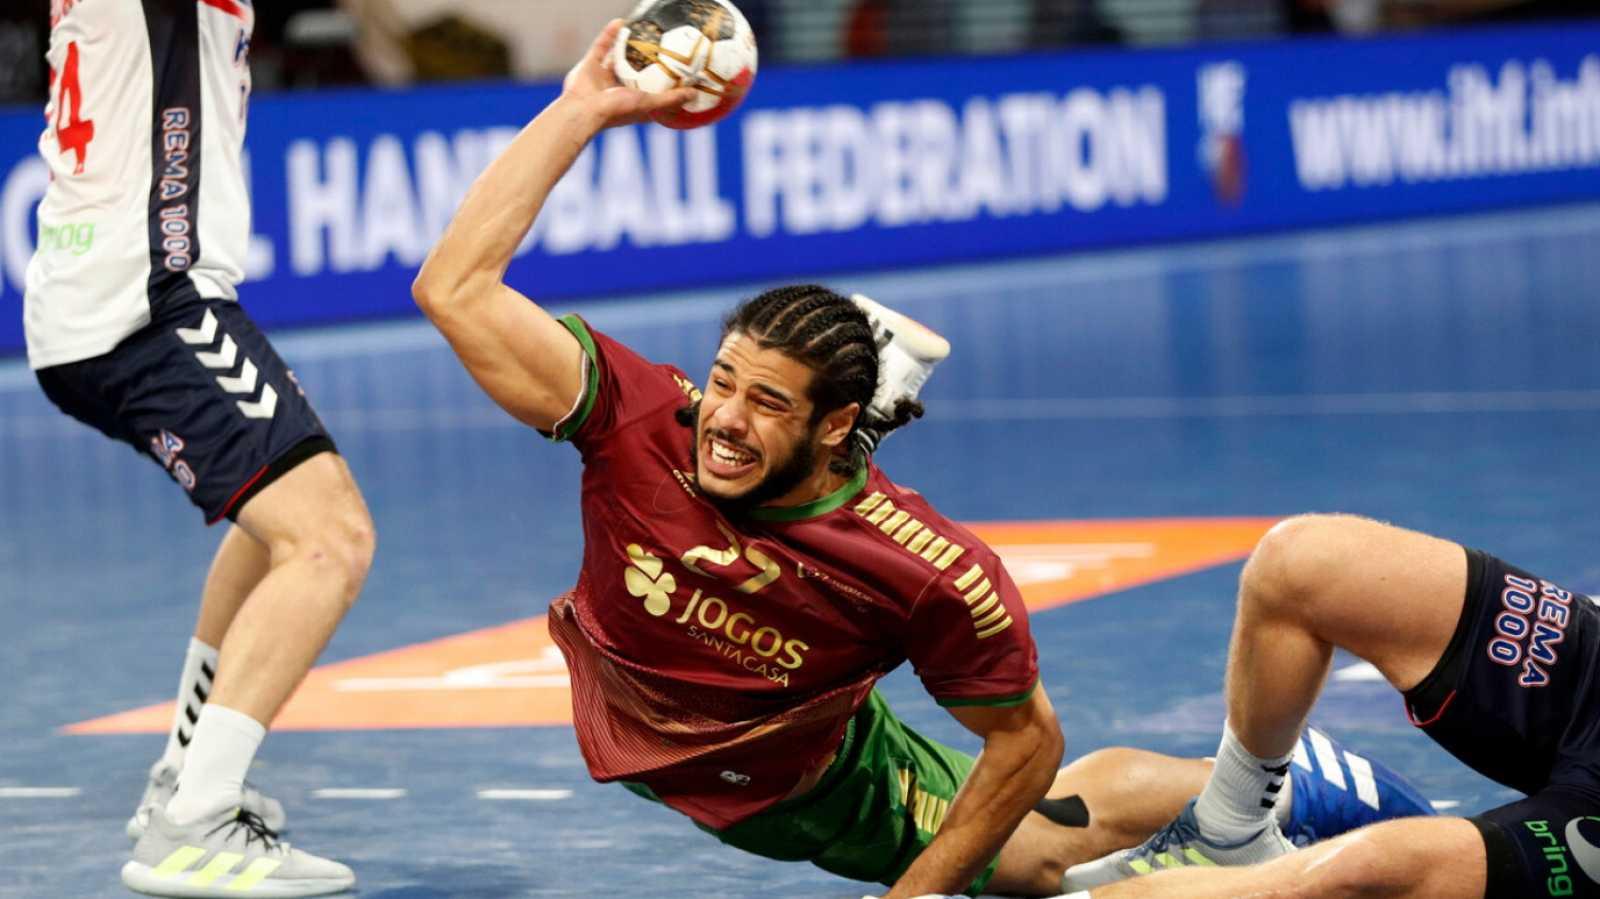 Balonmano - Campeonato del Mundo masculino. 2ª fase: Portugal - Noruega - ver ahora